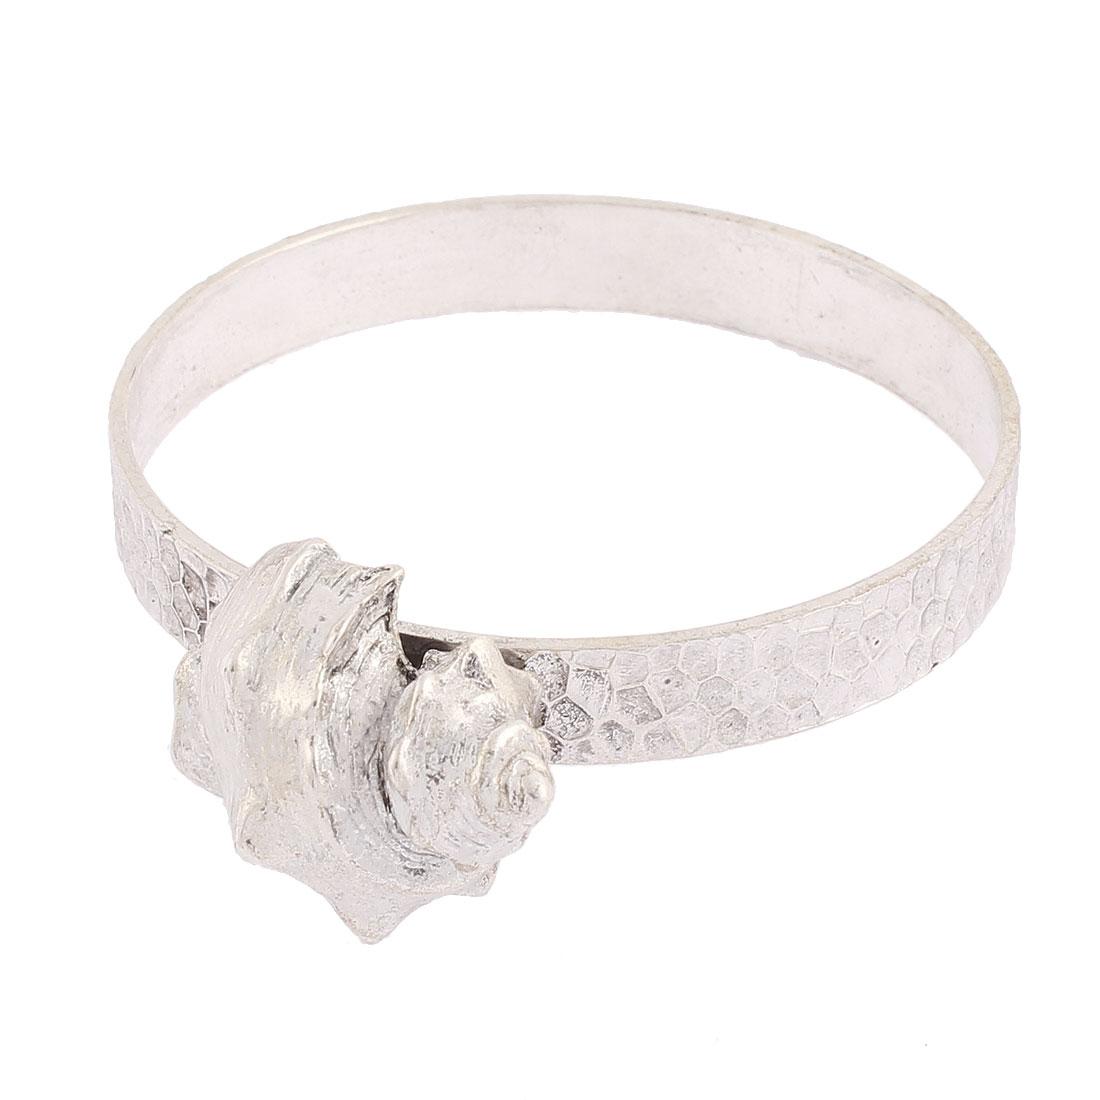 Conch Shell Detailing Circle Wrist Bracelet Silver Tone